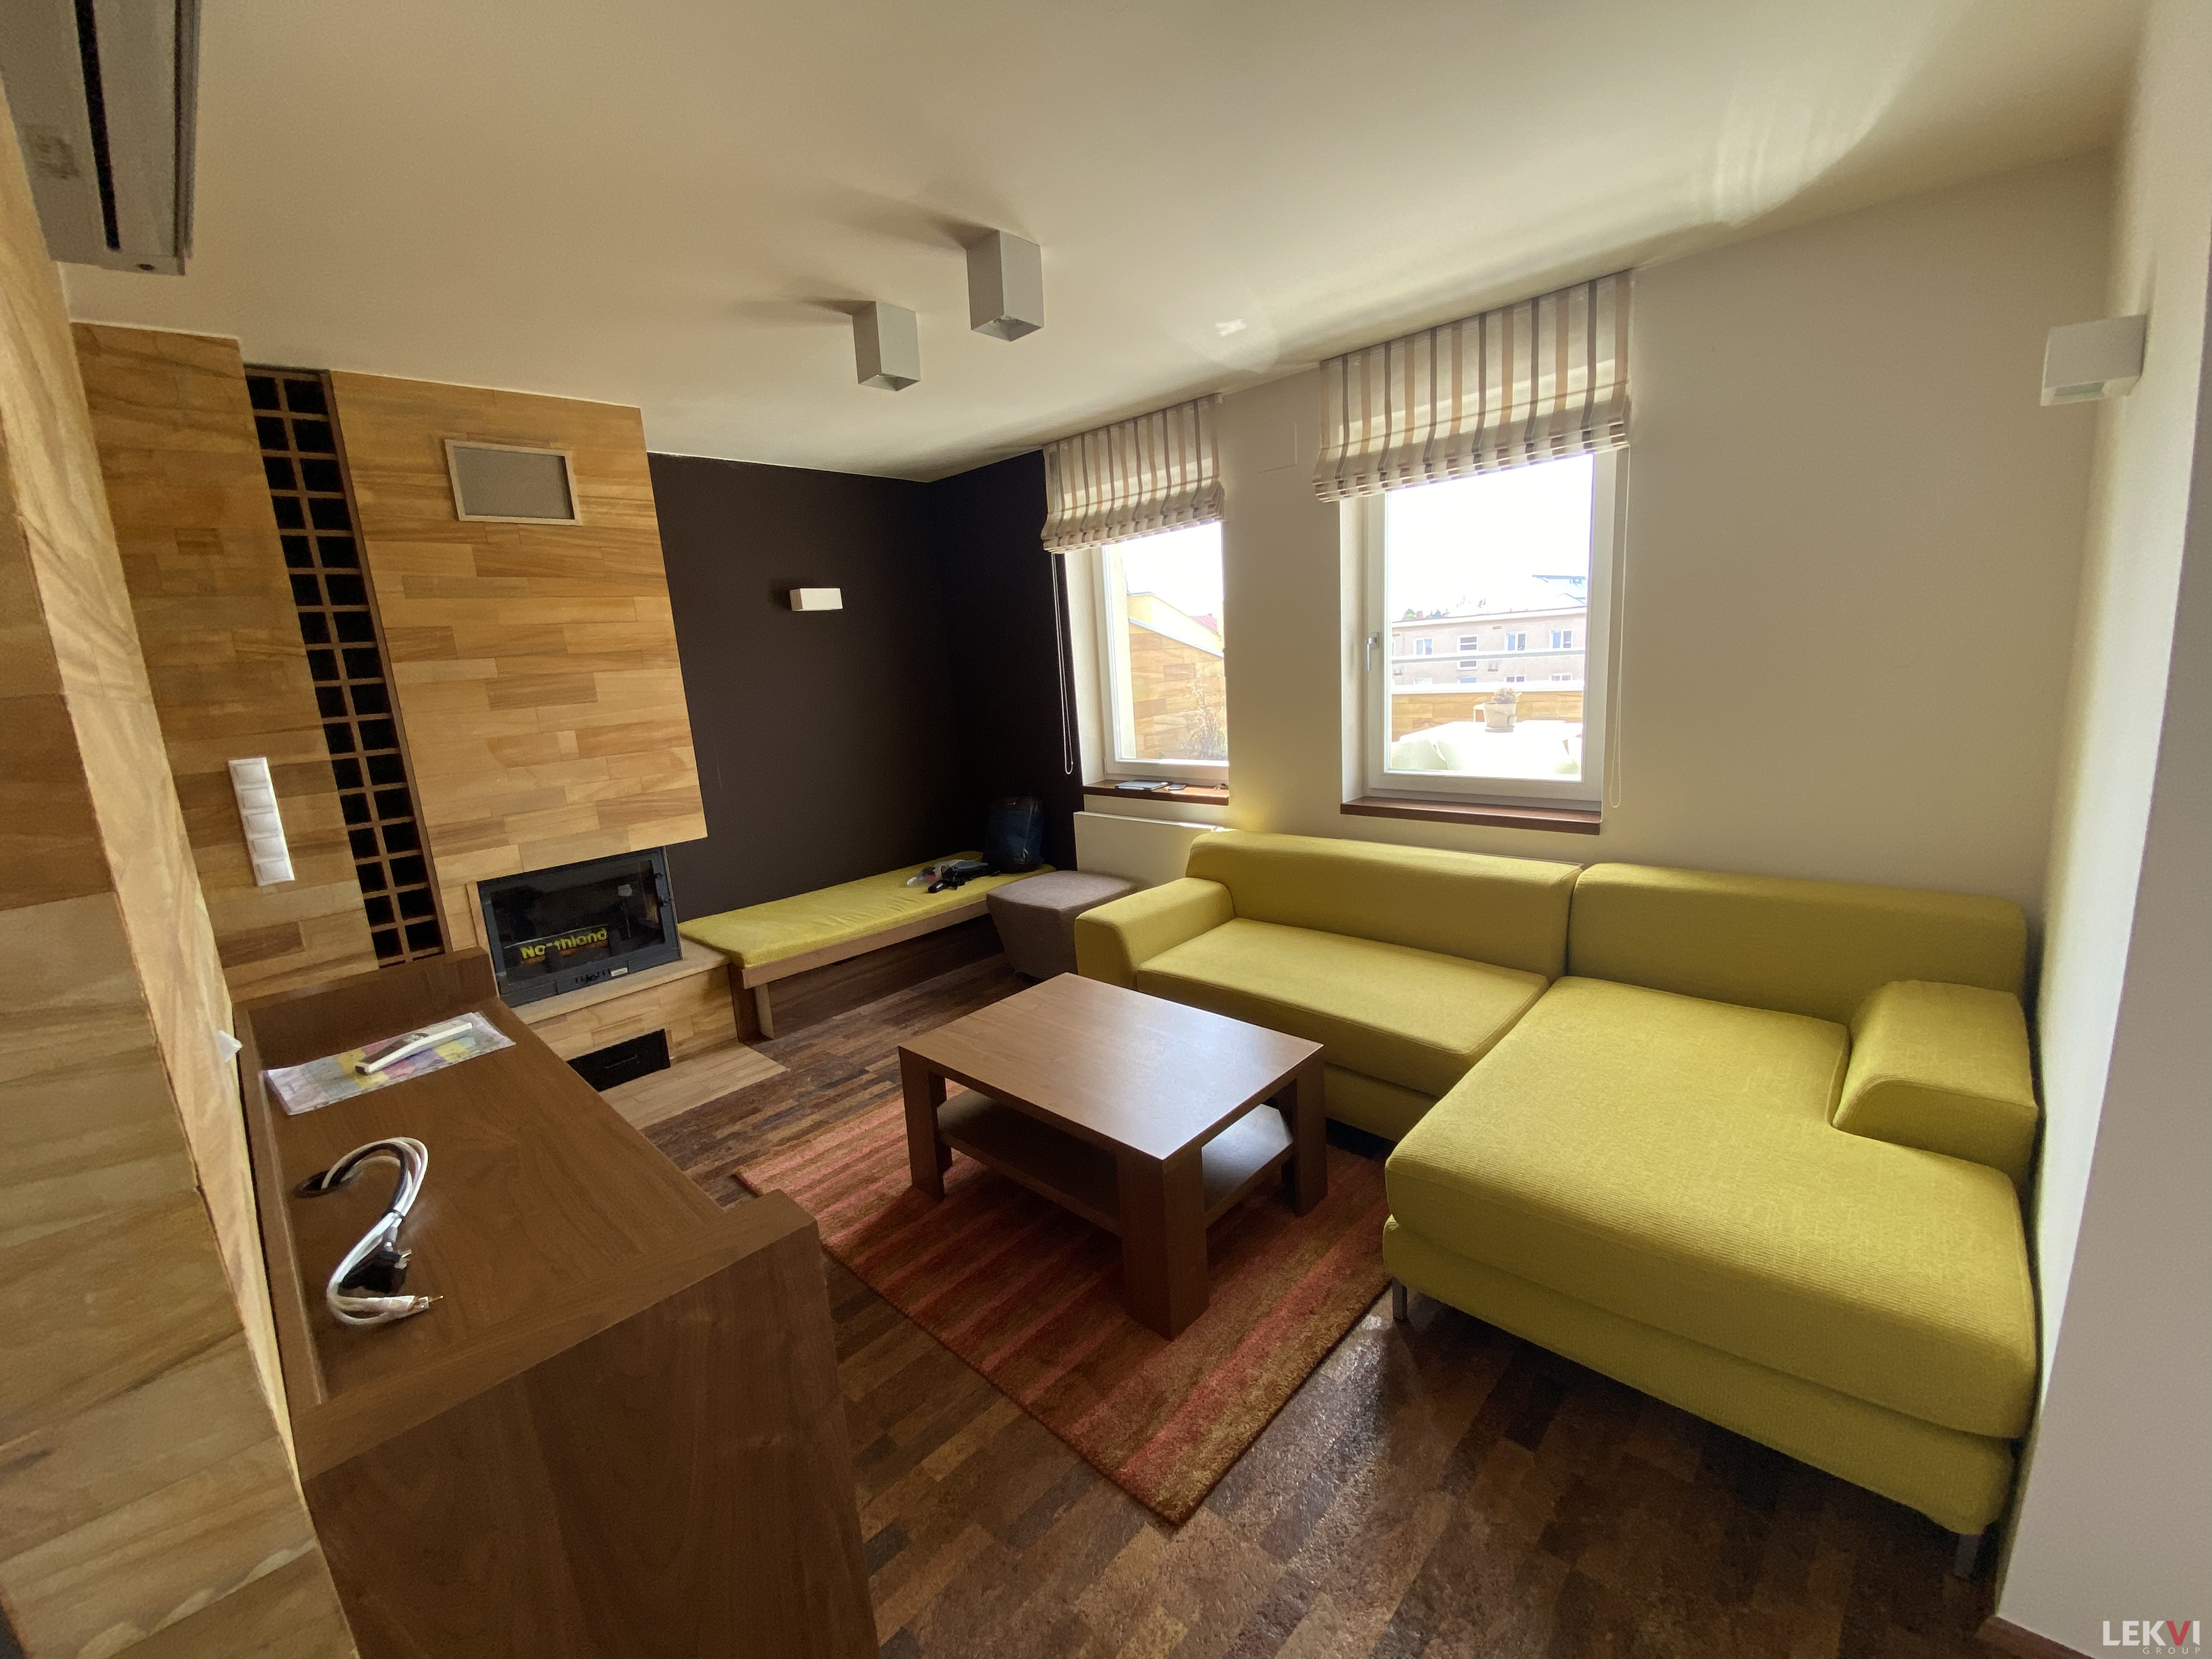 For sale flat 2+kk, 60 m2 - Dvořákova,